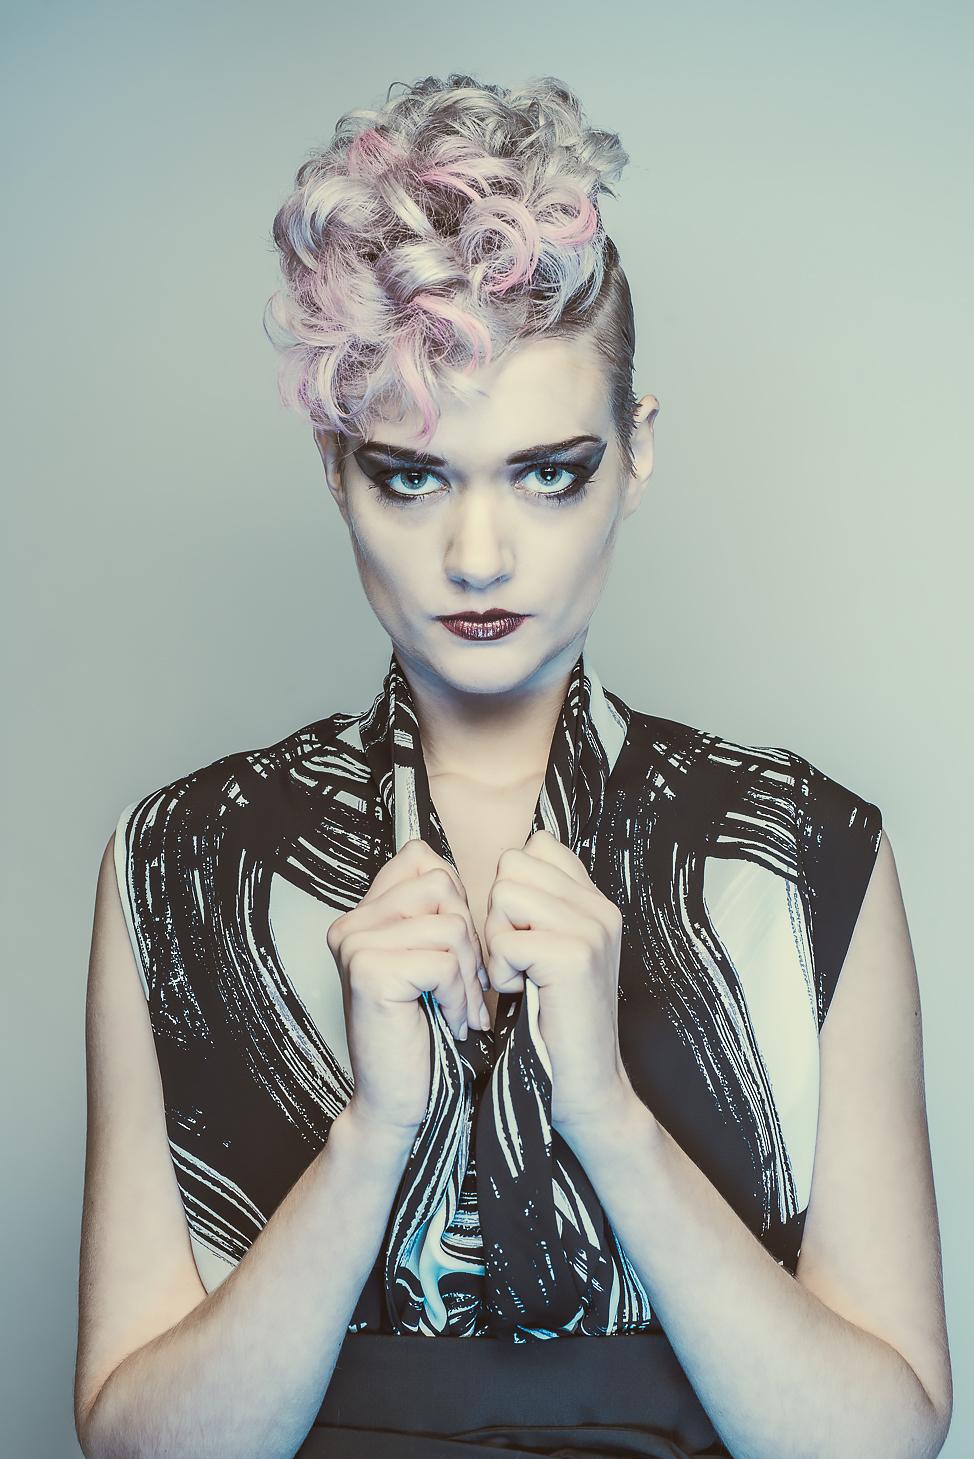 zaramia-ava-zaramiaava-leeds-fashion-designer-ethical-sustainable-tailored-minimalist-emi-print-black-belt-versatile-drape-cowl-styling-womenswear-models-photoshoot-shrine-hairdressers-71